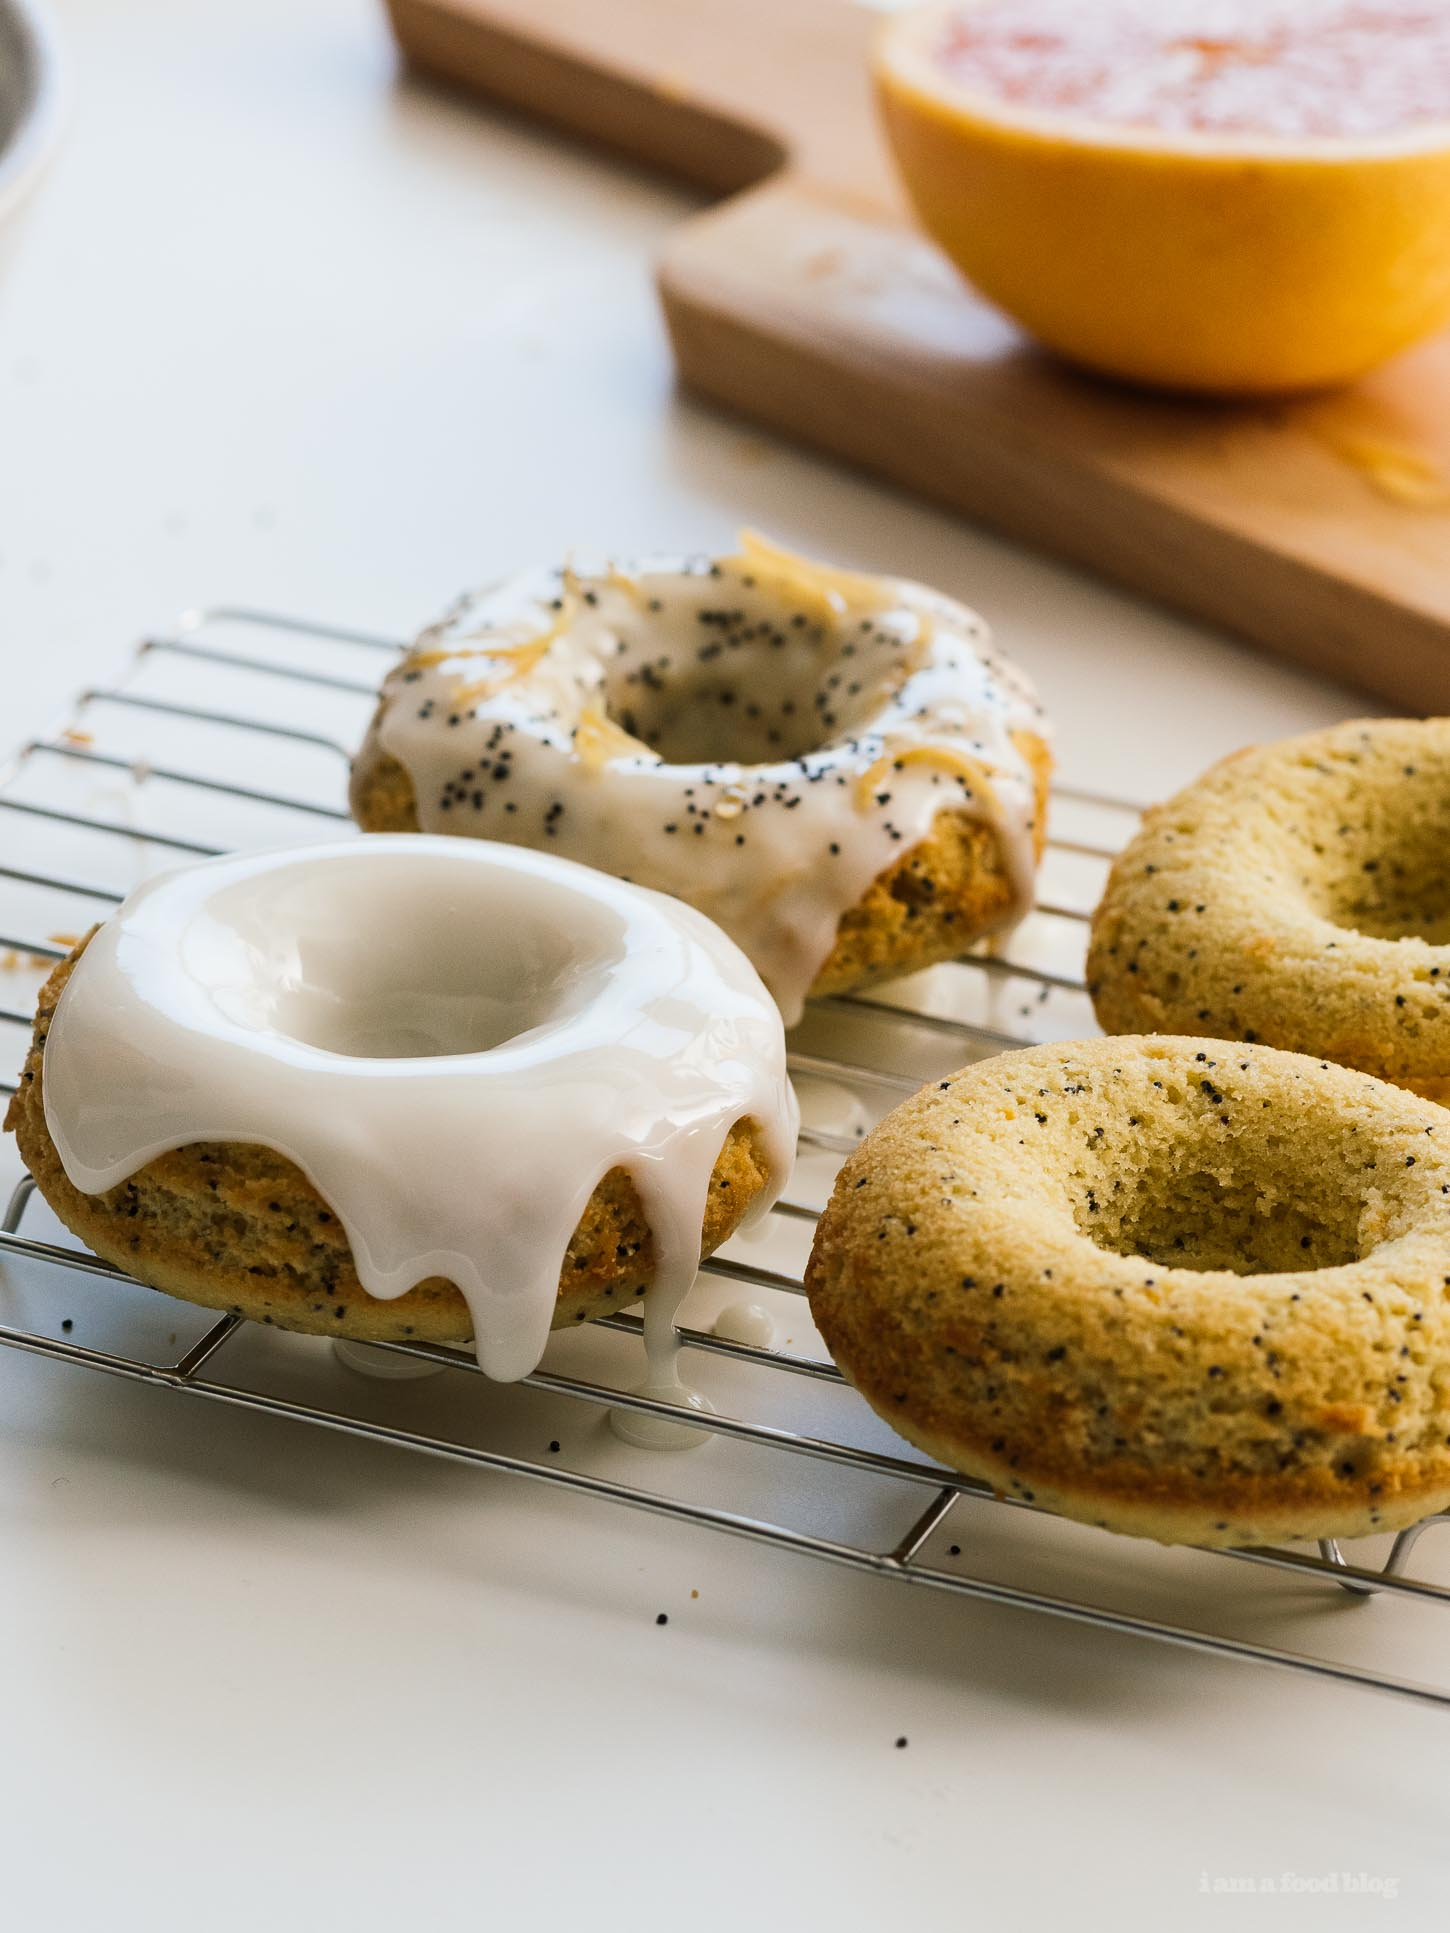 Grapefruit Olive Oil Yogurt Baked Donuts Recipe | www.iamafoodblog.com